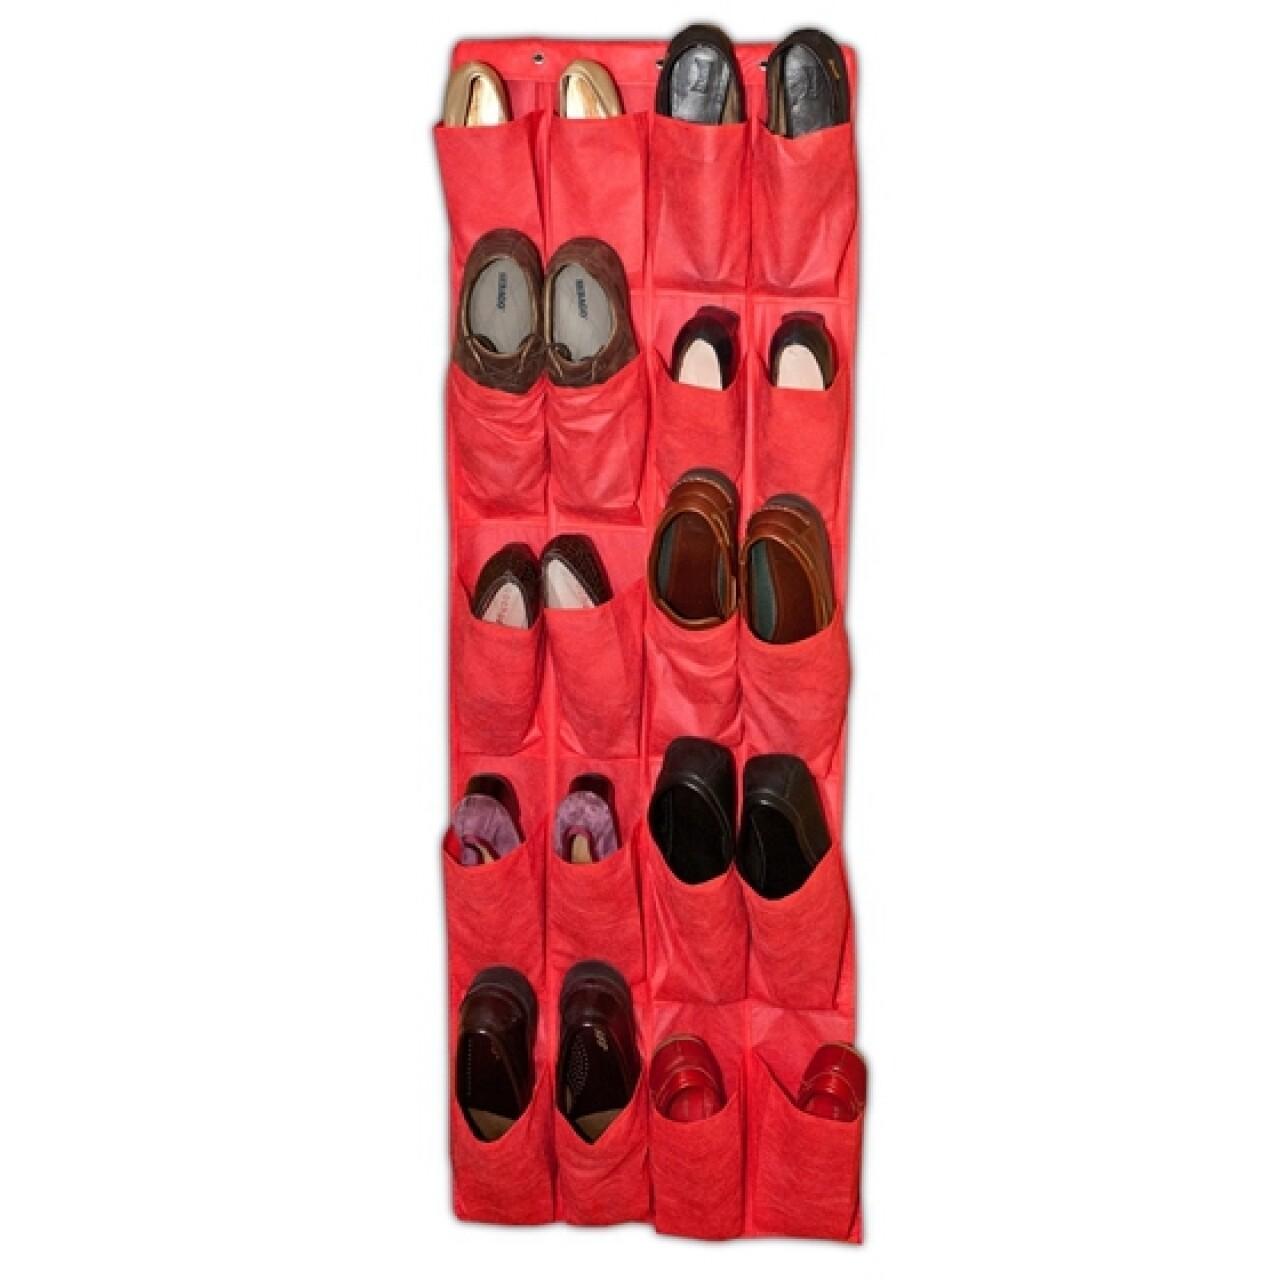 Organizator de pantofi Jocca Red